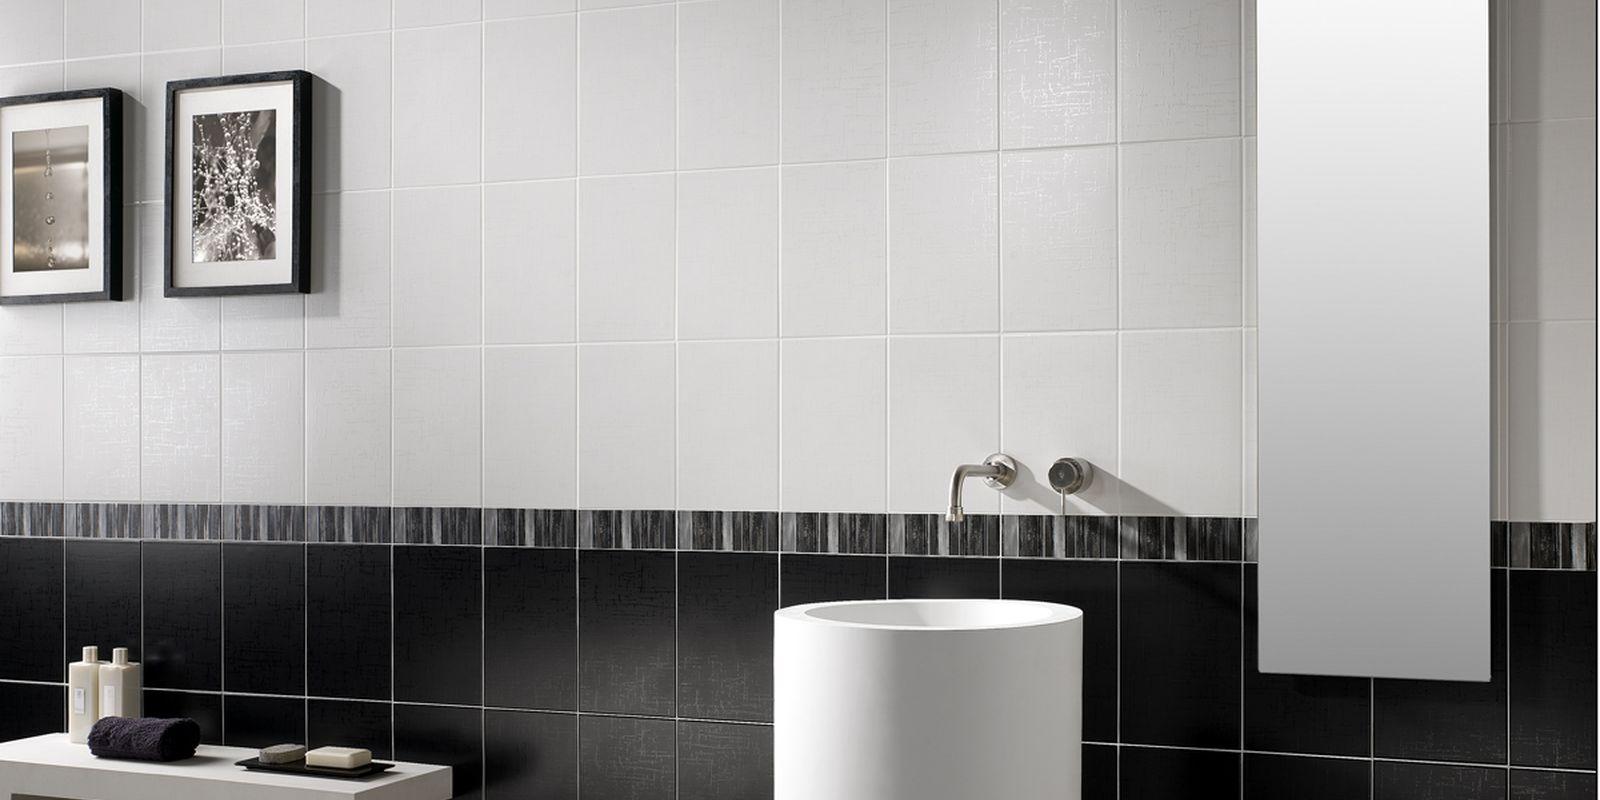 imola joker dg 20x30 forgiarini destockage carrelage pour les murs. Black Bedroom Furniture Sets. Home Design Ideas